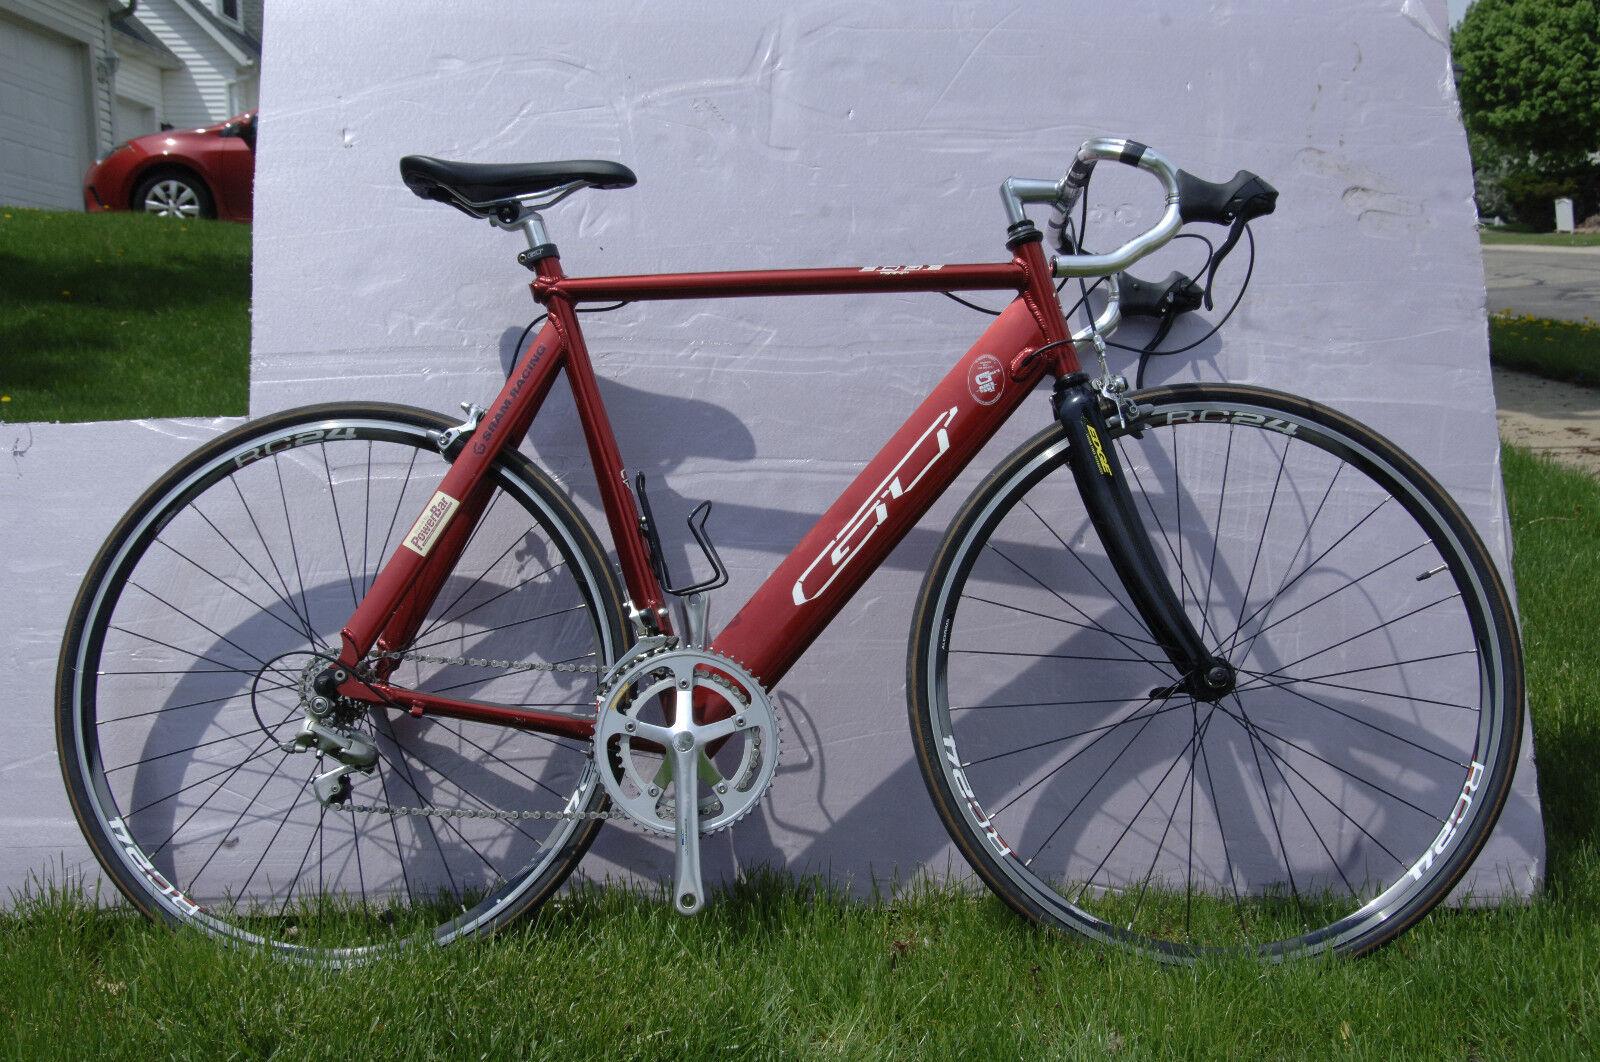 GT Edge Aero Aluminum 56 cm, upgraded, 2x8 gears, Alex R24 clinchers, rebuilt